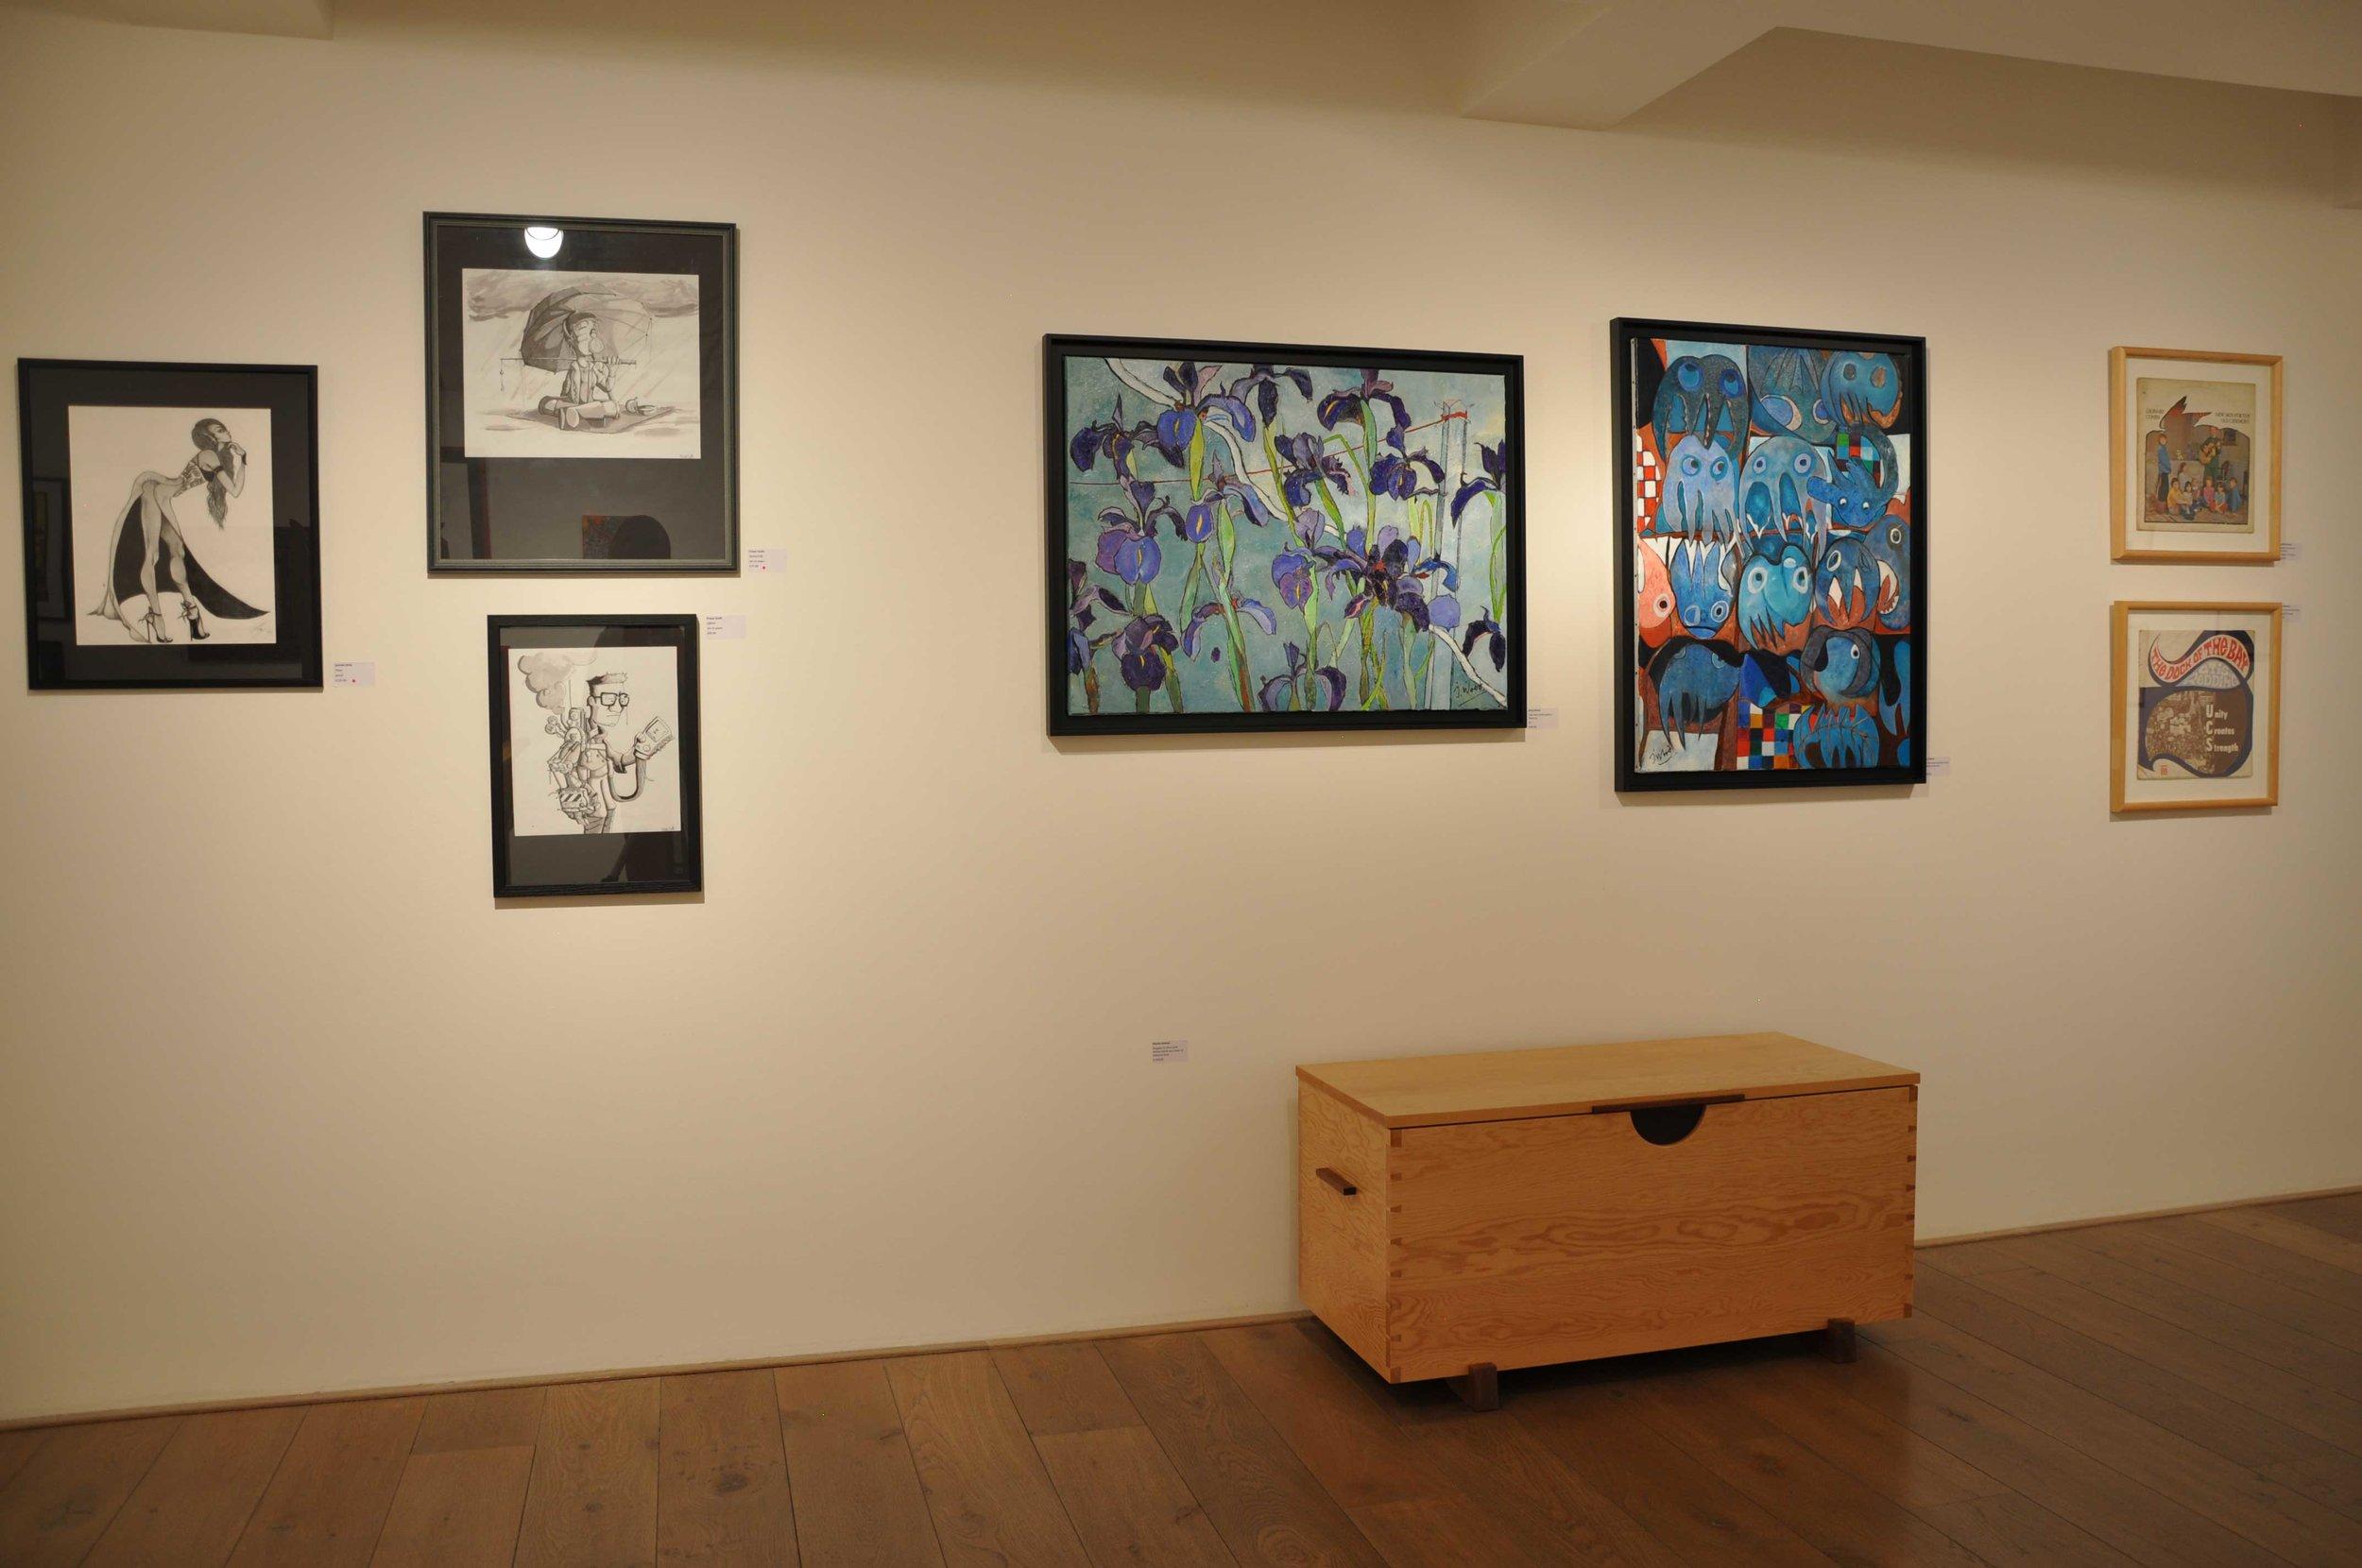 Gallery-3-b.jpg